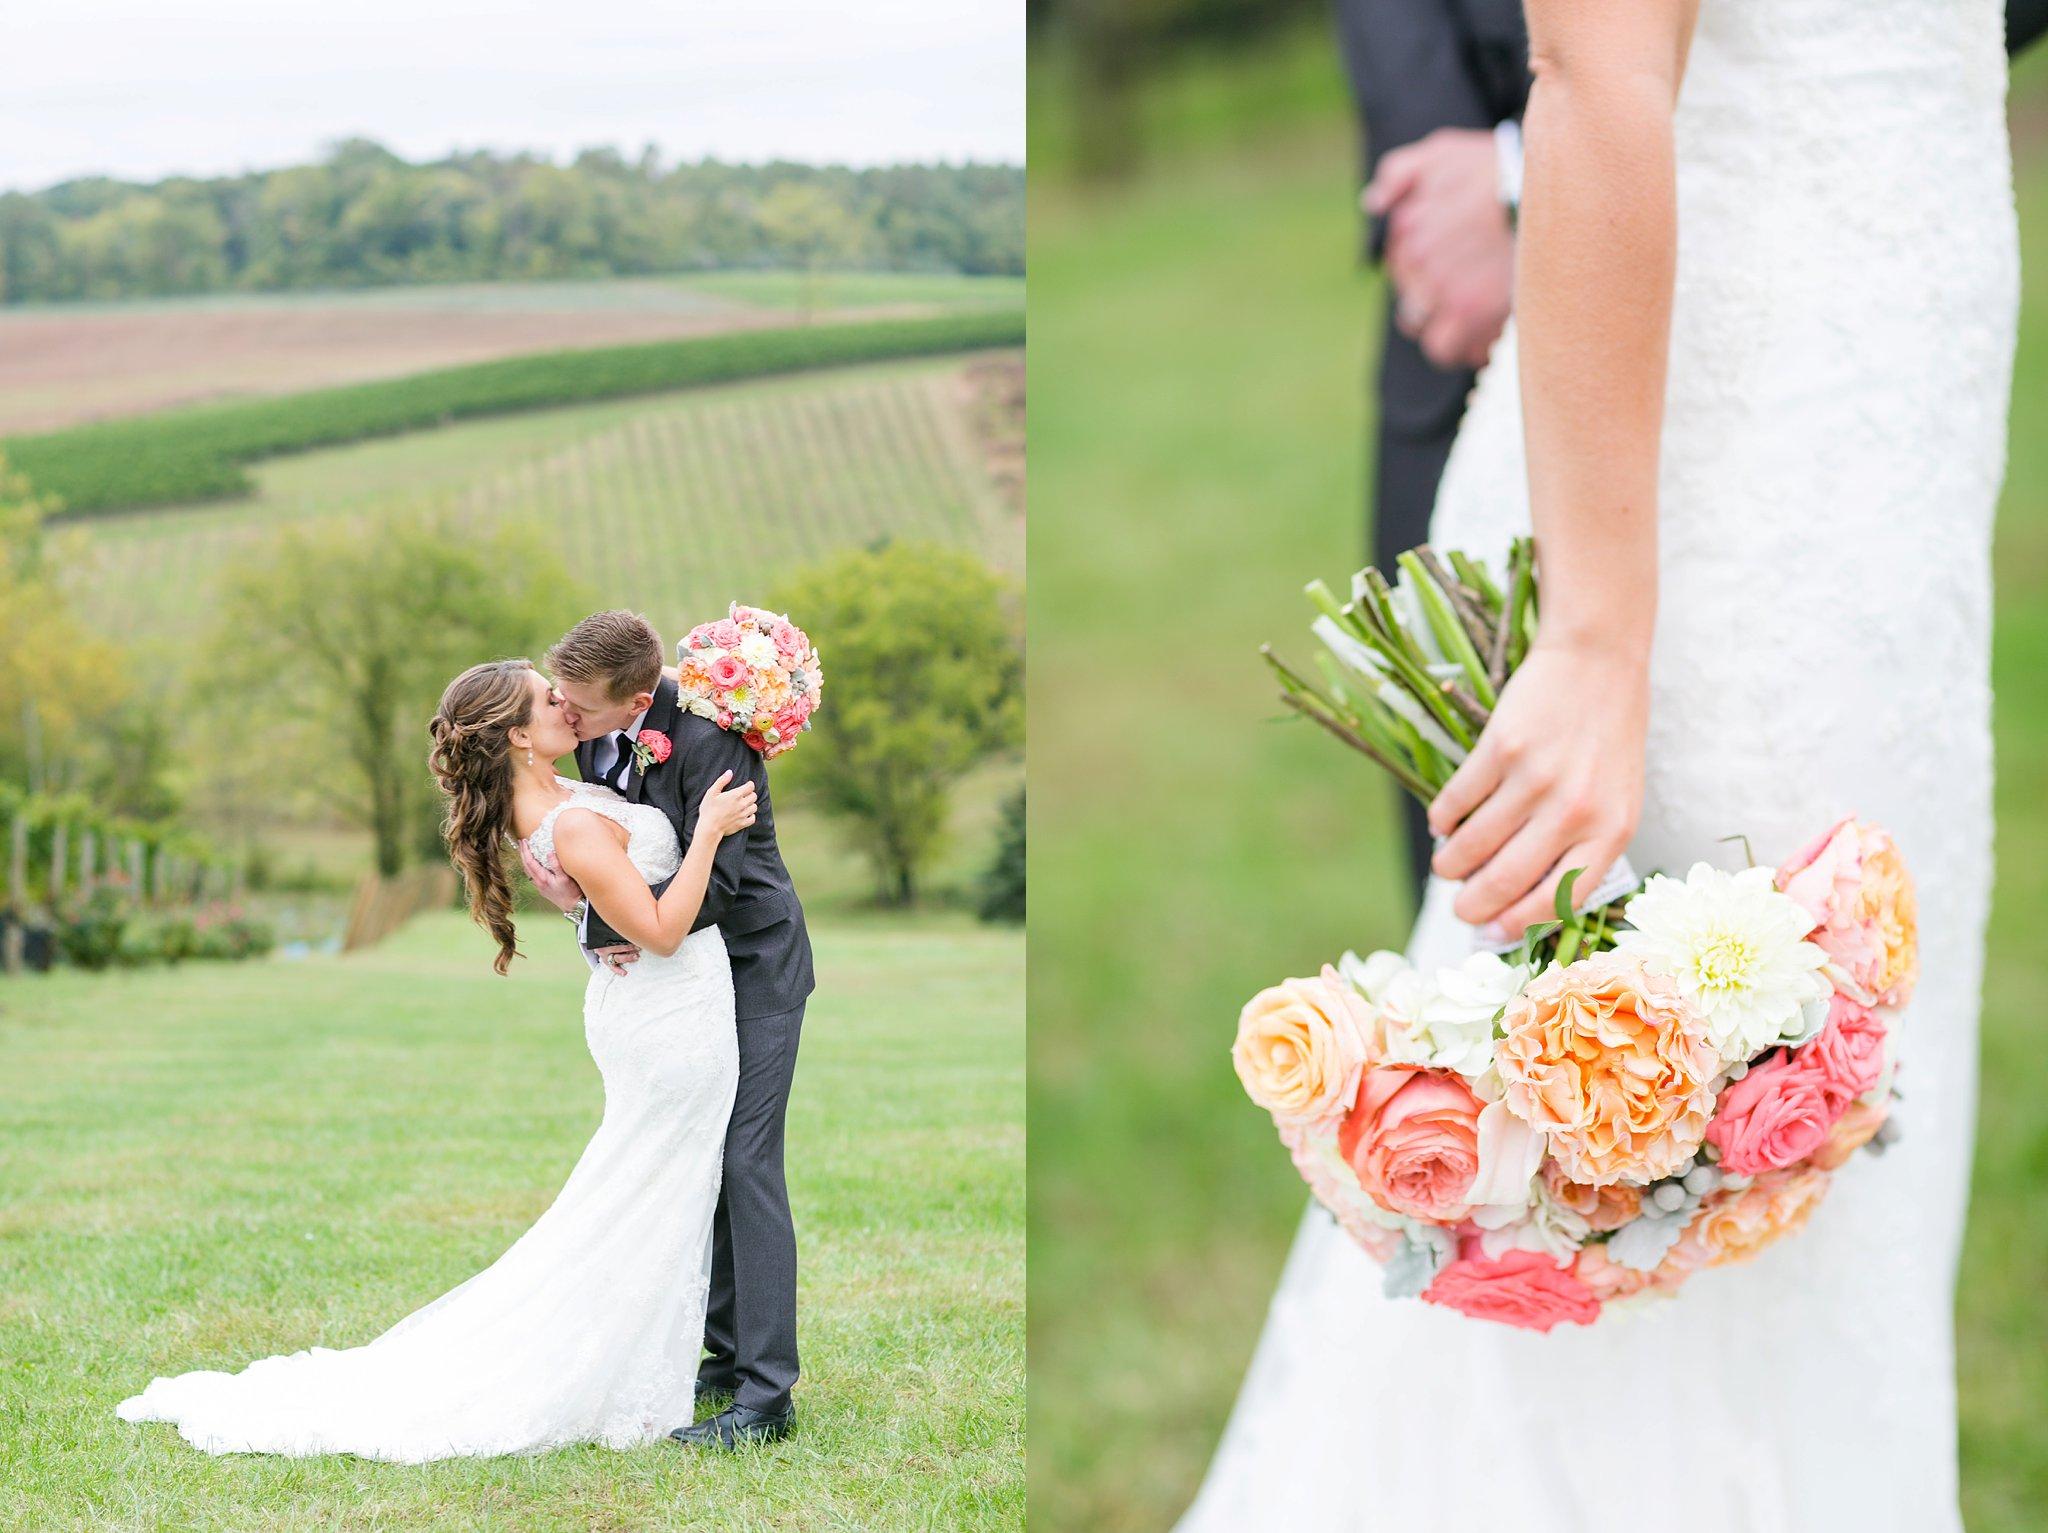 Stone Tower Winery Wedding Photos Virginia Wedding Photographer Megan Kelsey Photography Sam & Angela-236.jpg